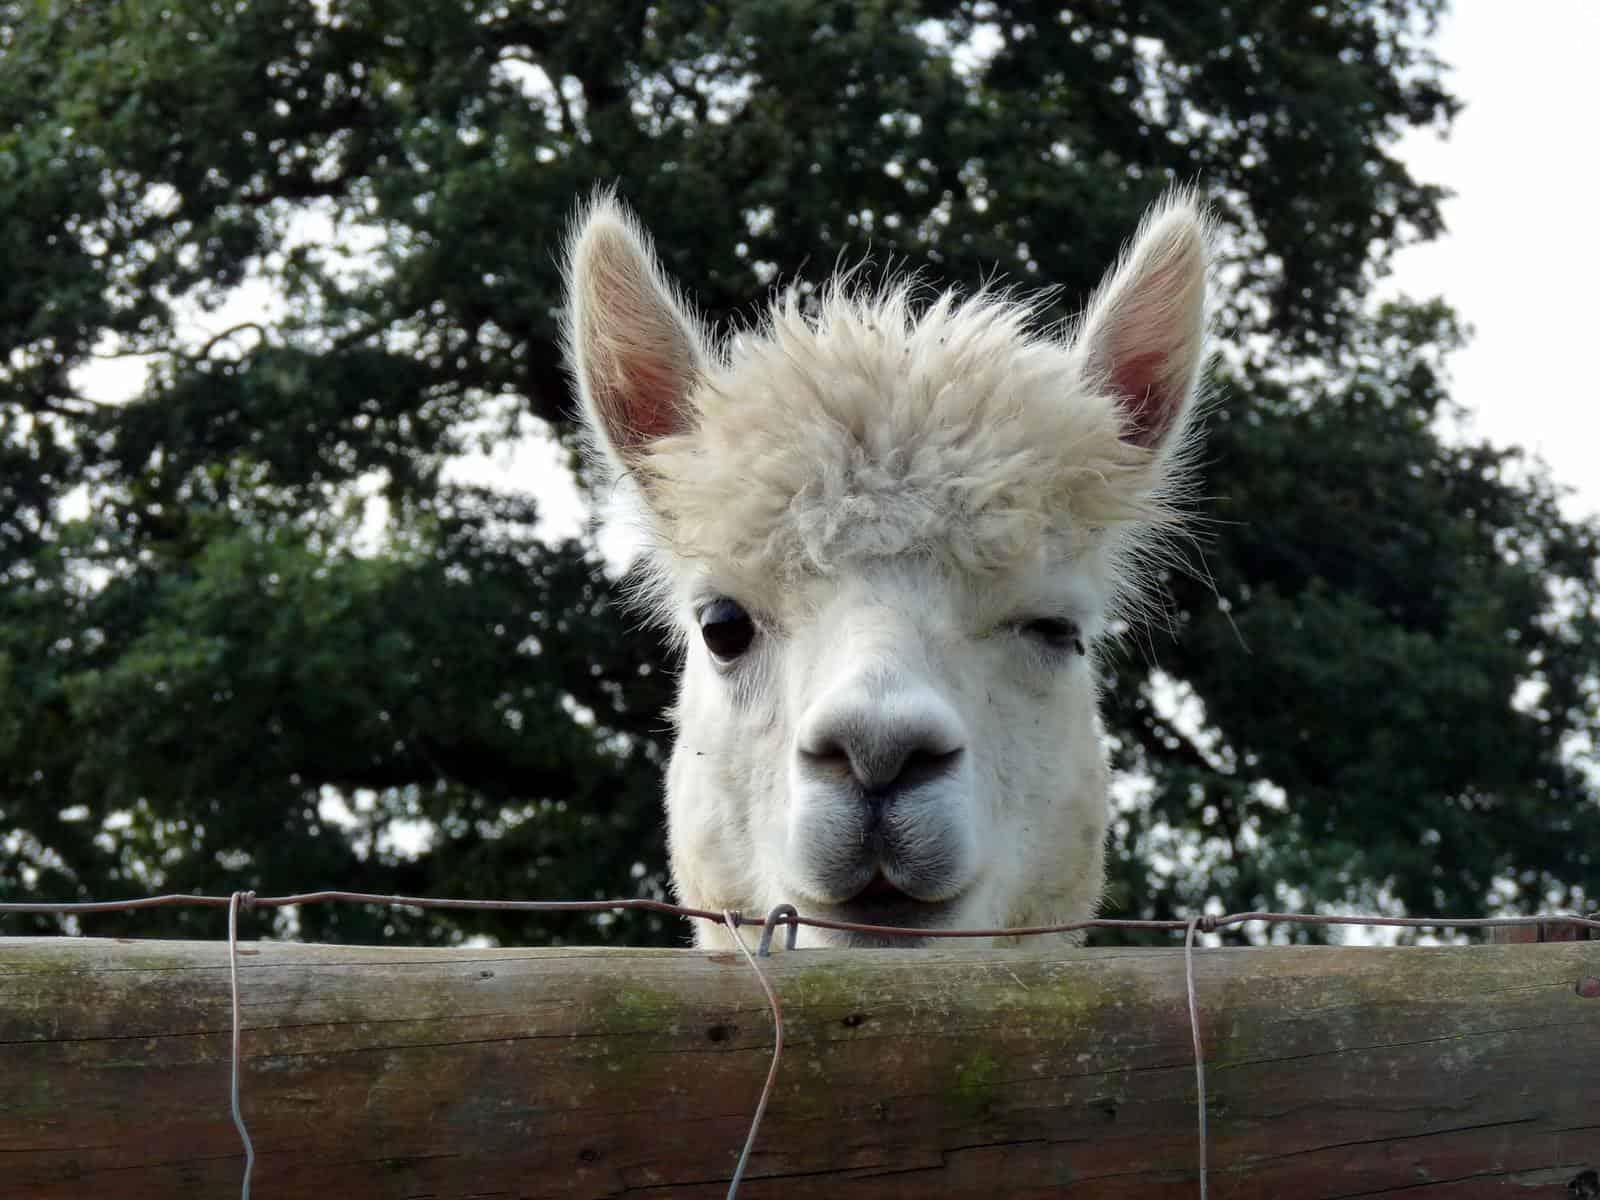 Winking alpaca